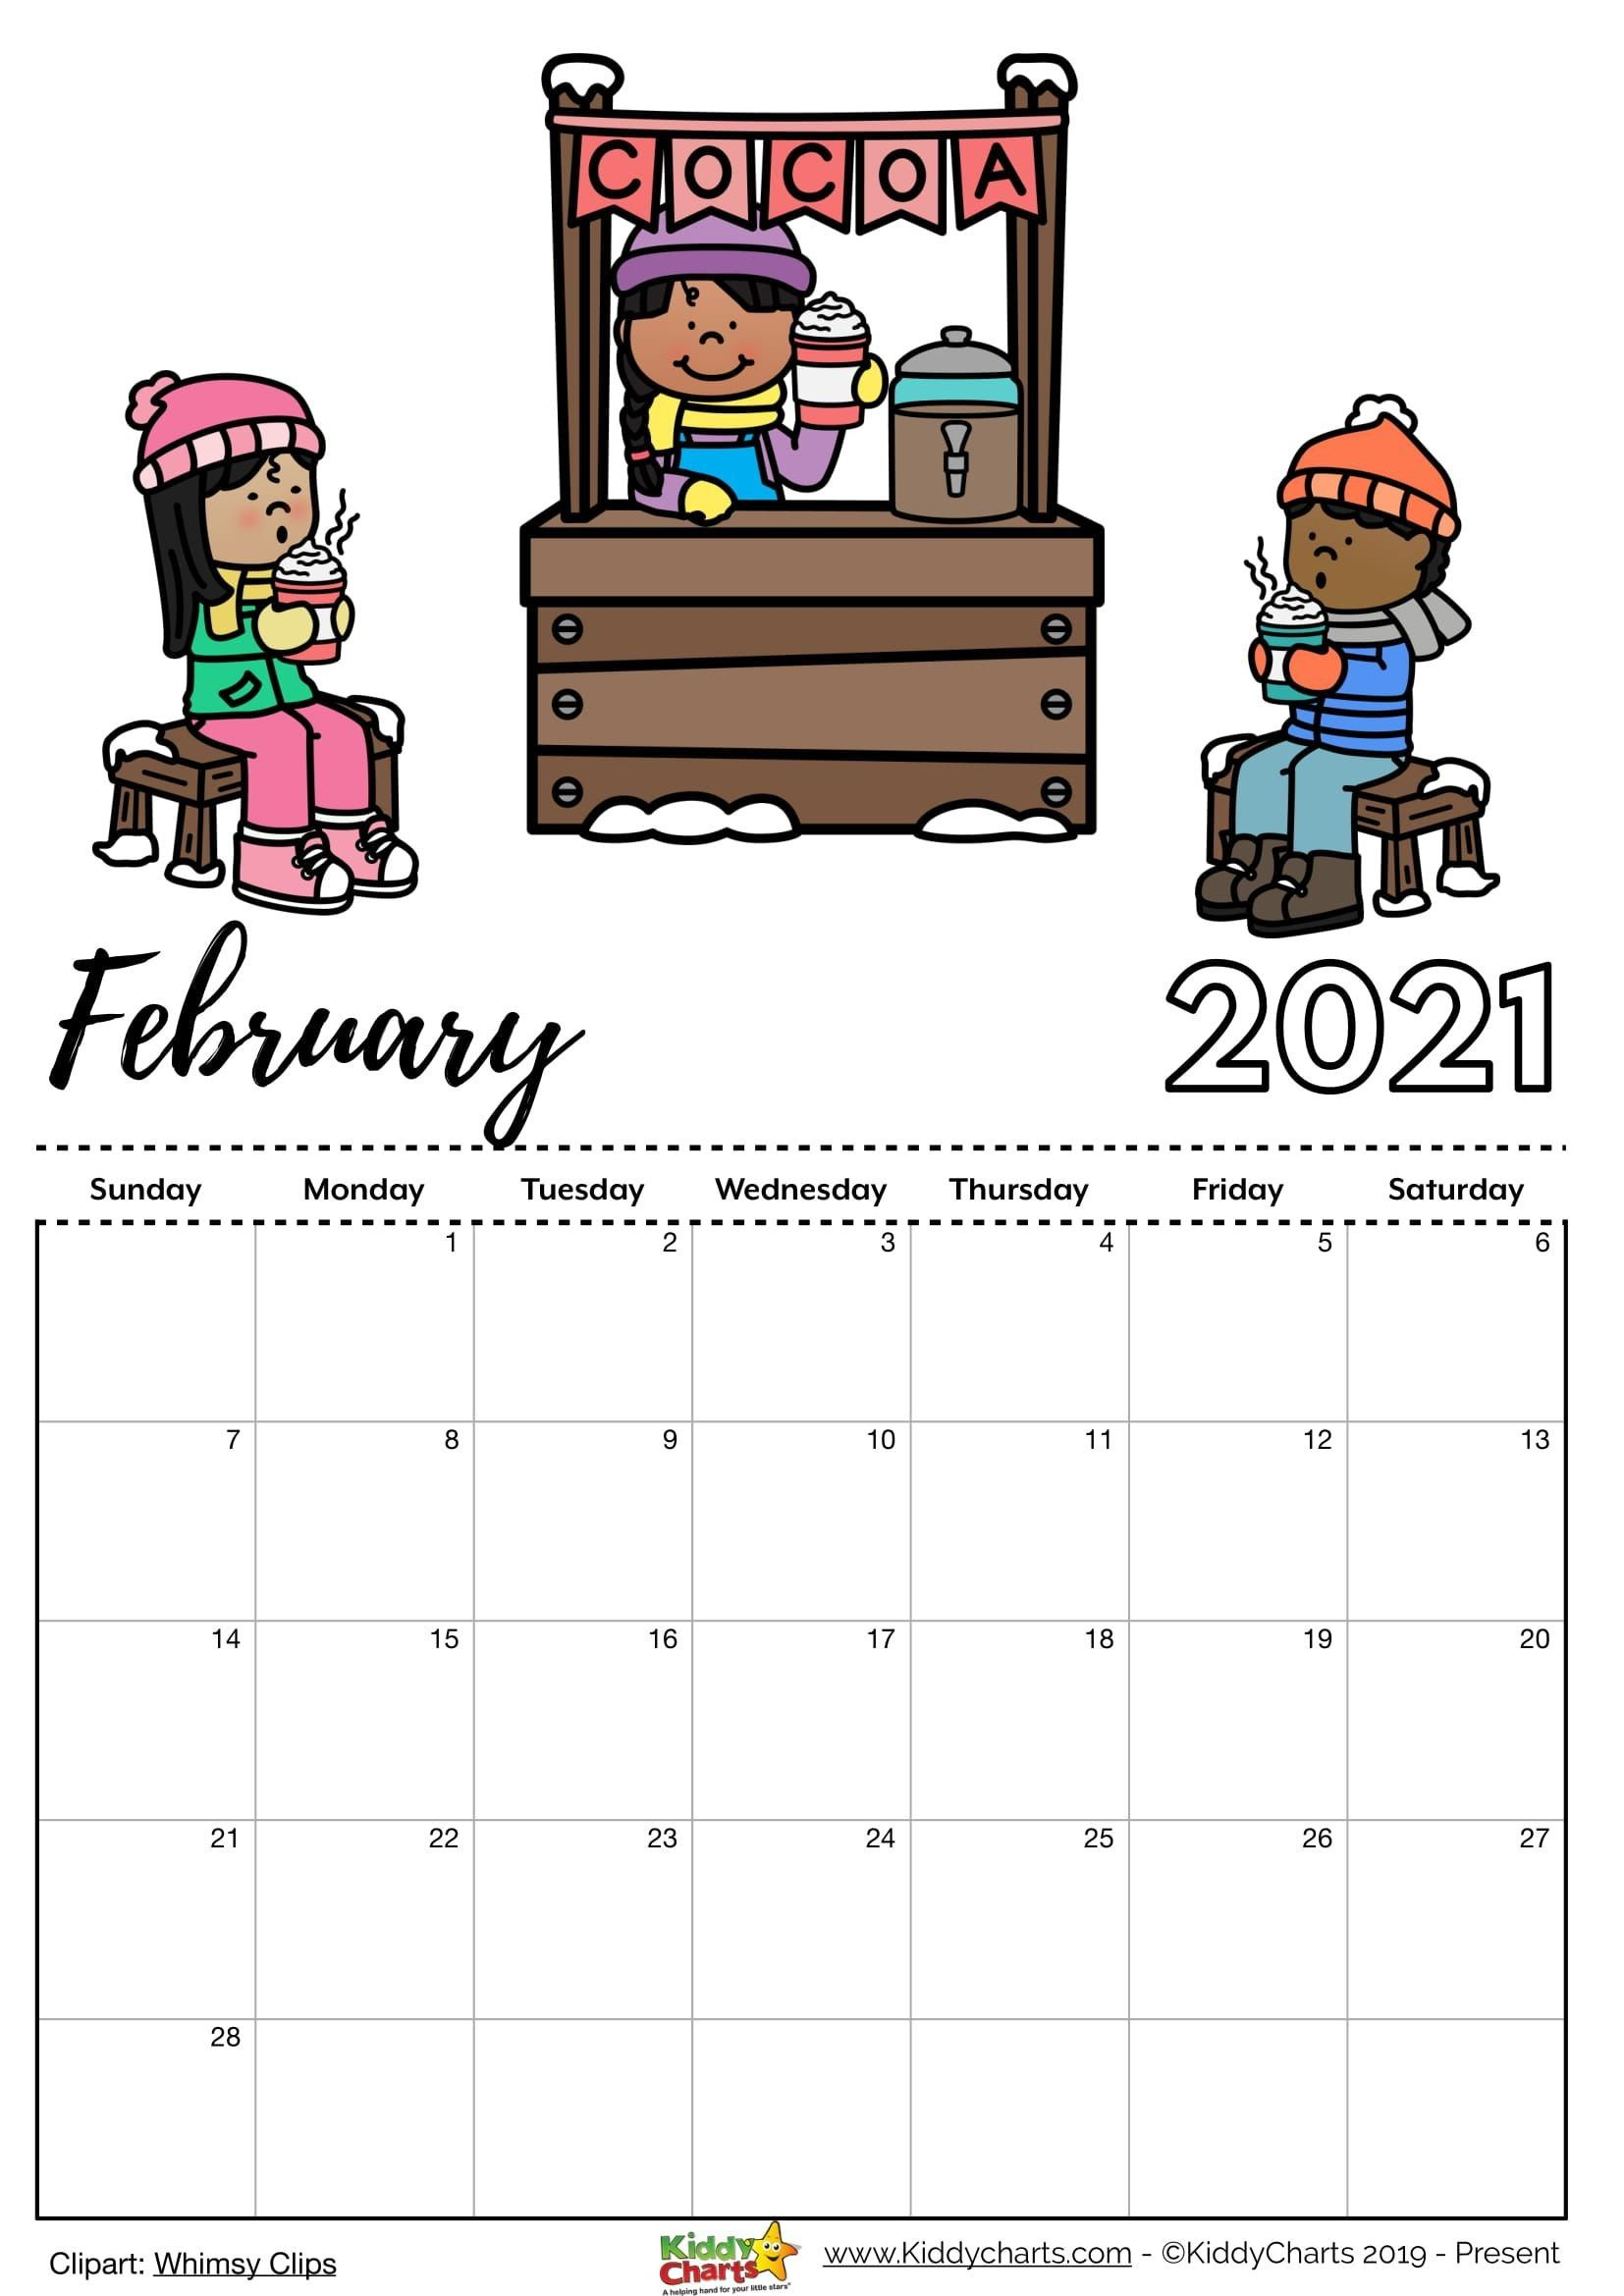 2021 February Editable Calendar In 2021 | Printable Calendar